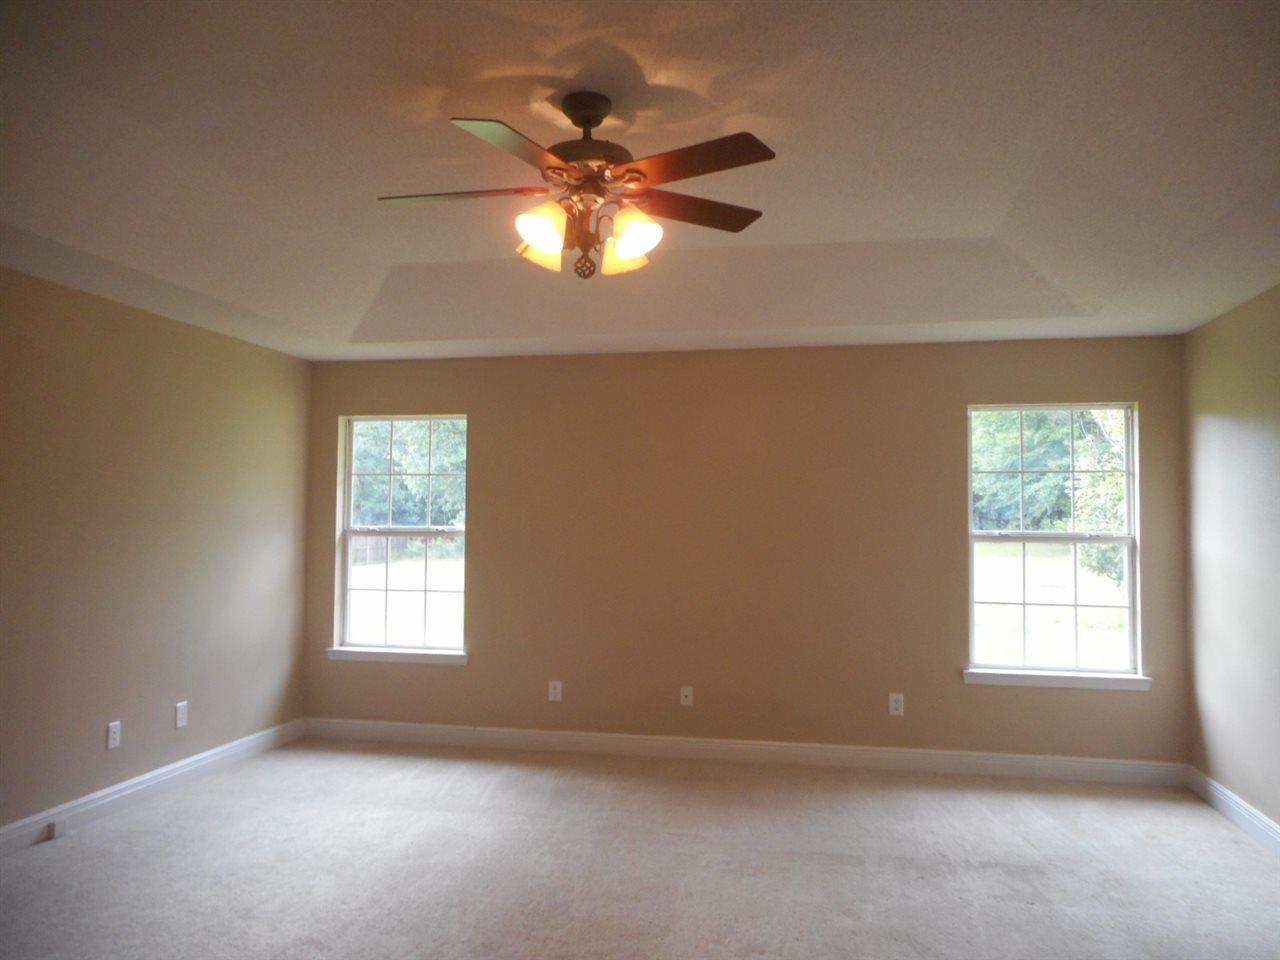 5123 Gardenbrook Blvd, Milton, FL 32570